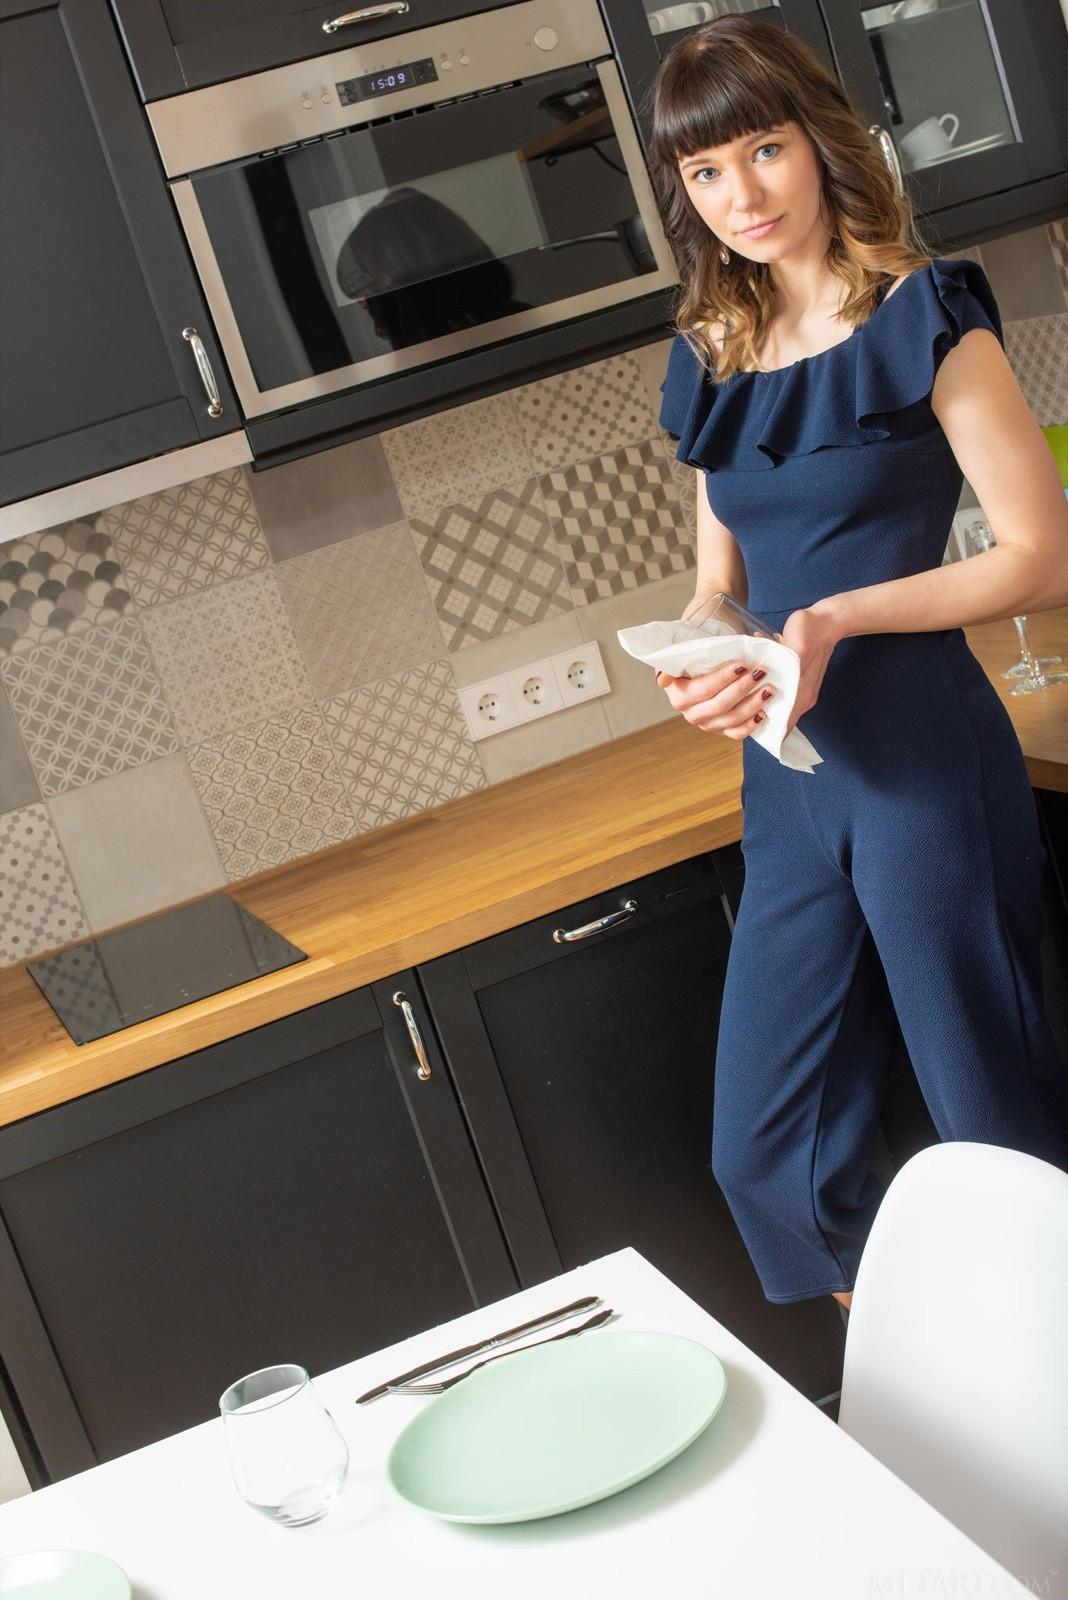 Стройная голая девушка на кухне - фото